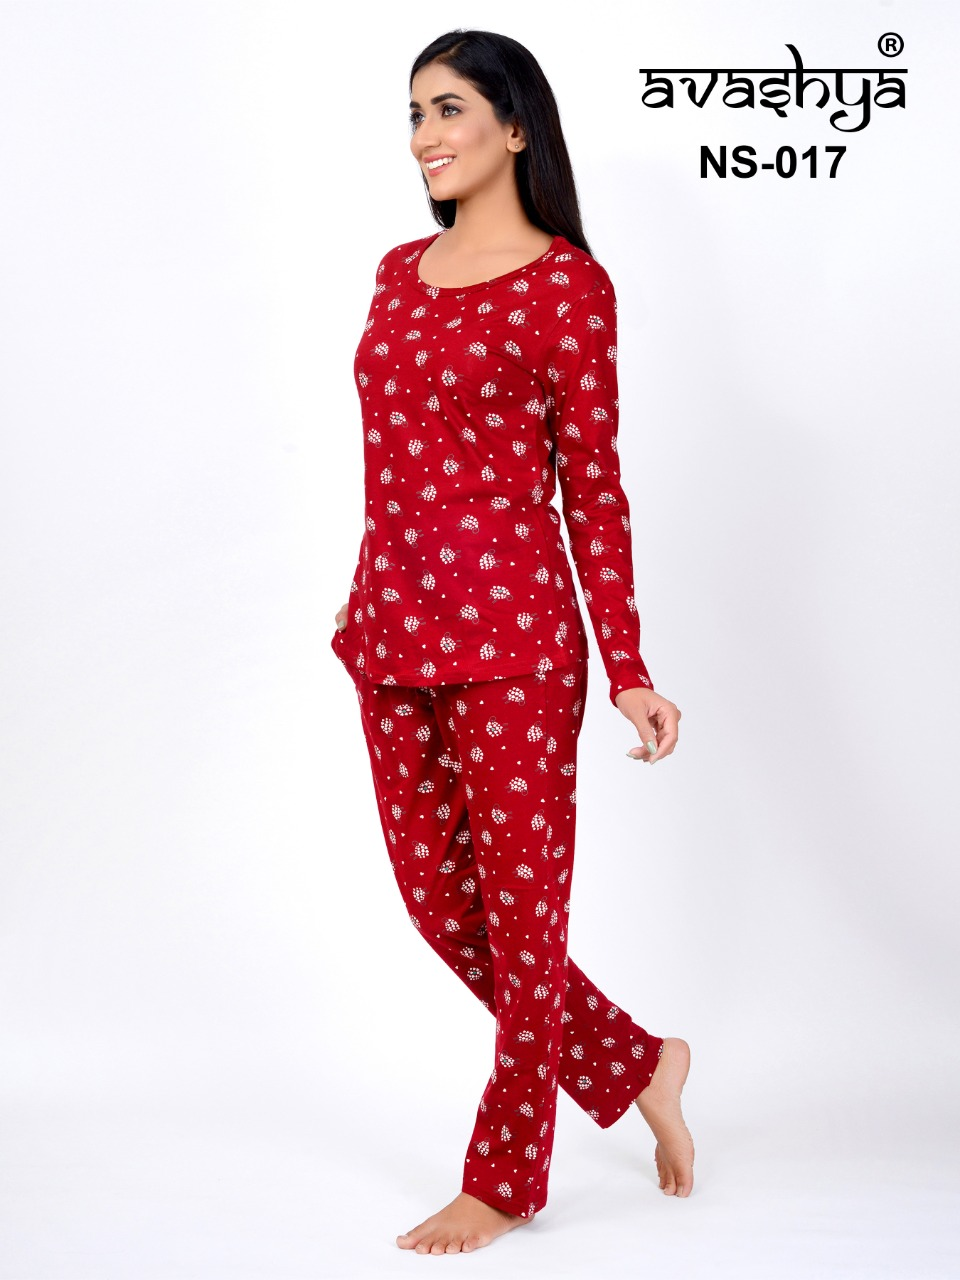 Avashya Premium Night Wear Vol 3 Wholesale Catalog 6 Pcs 3 1 - Avashya Premium Night Wear Vol 3 Wholesale Catalog 6 Pcs